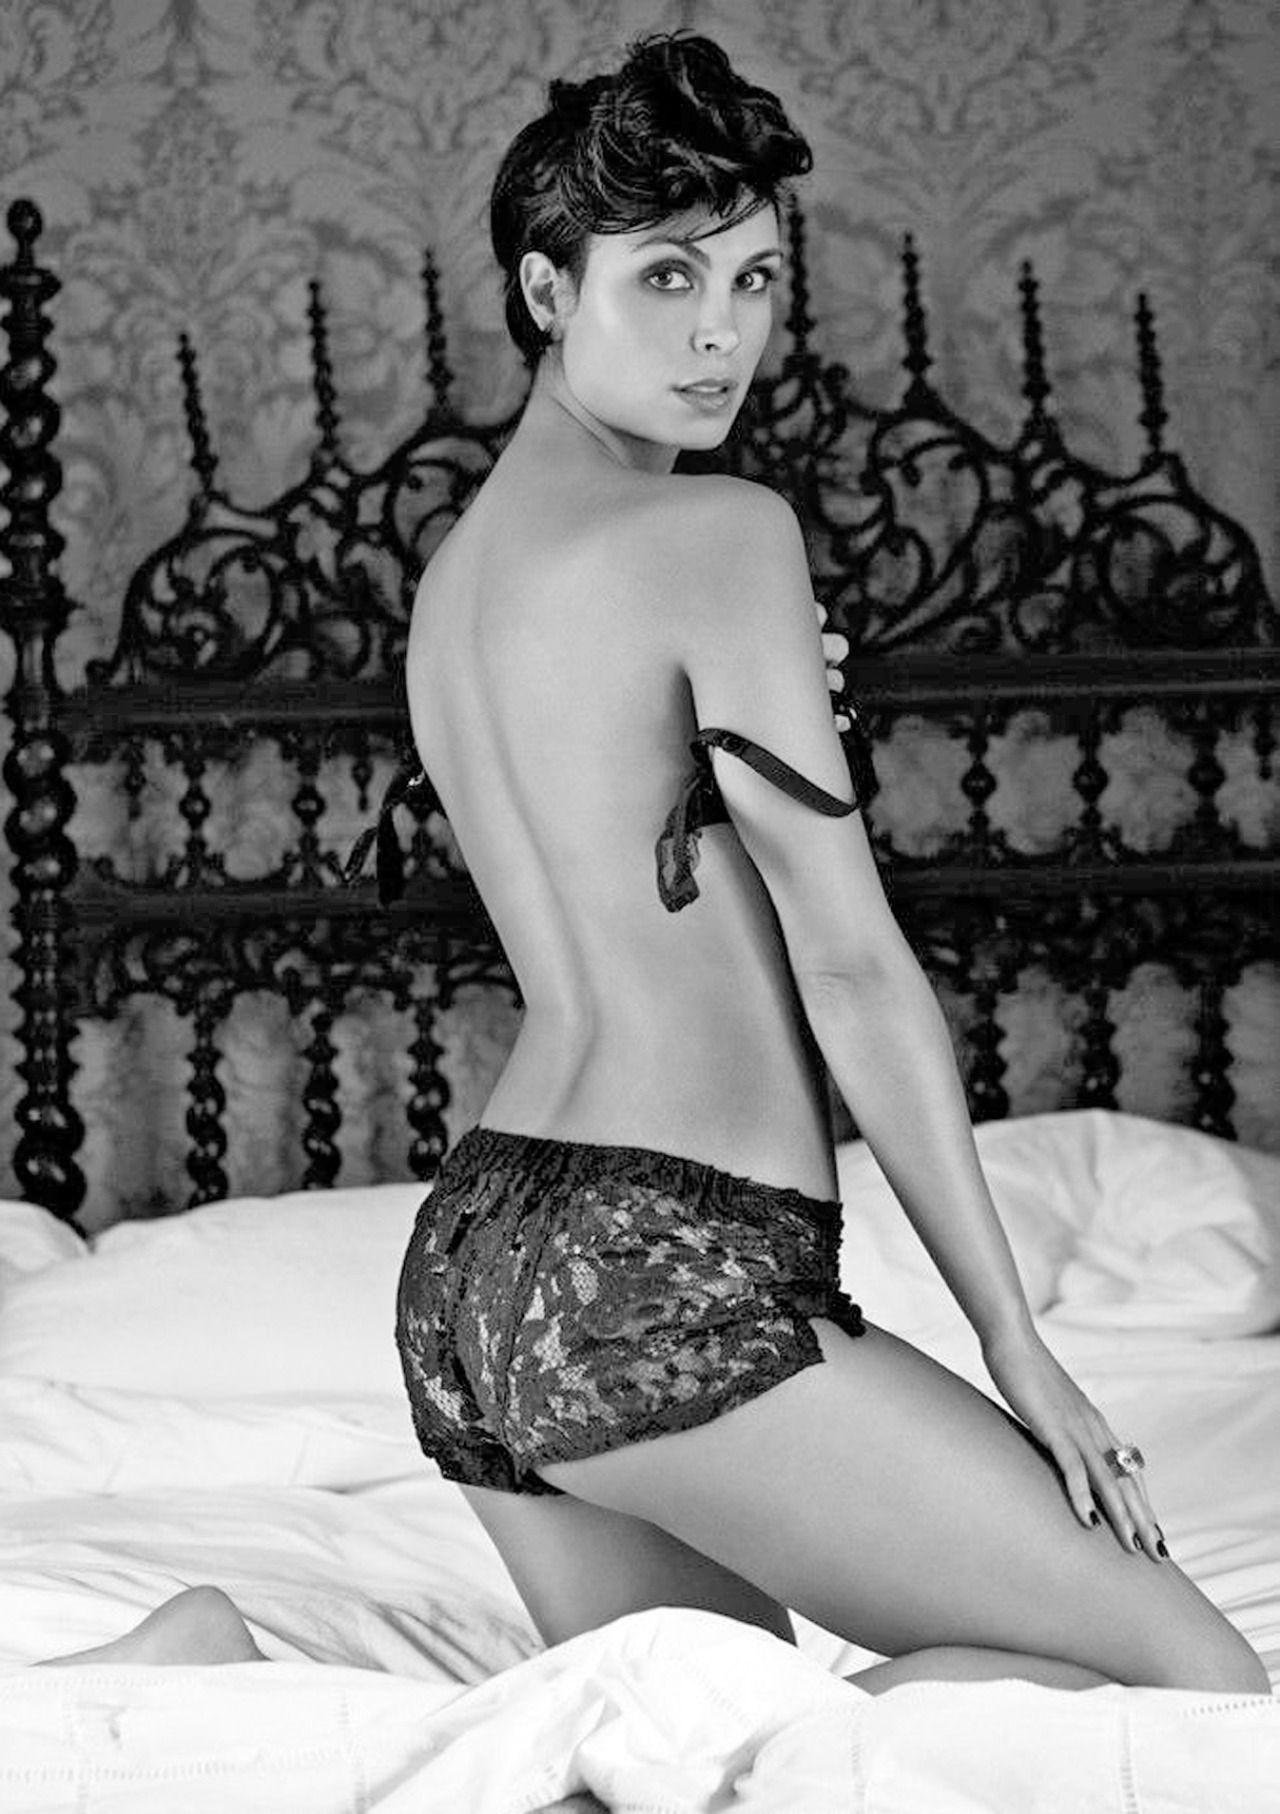 Feet Ivonne Montero nudes (91 photos), Pussy, Sideboobs, Twitter, braless 2017